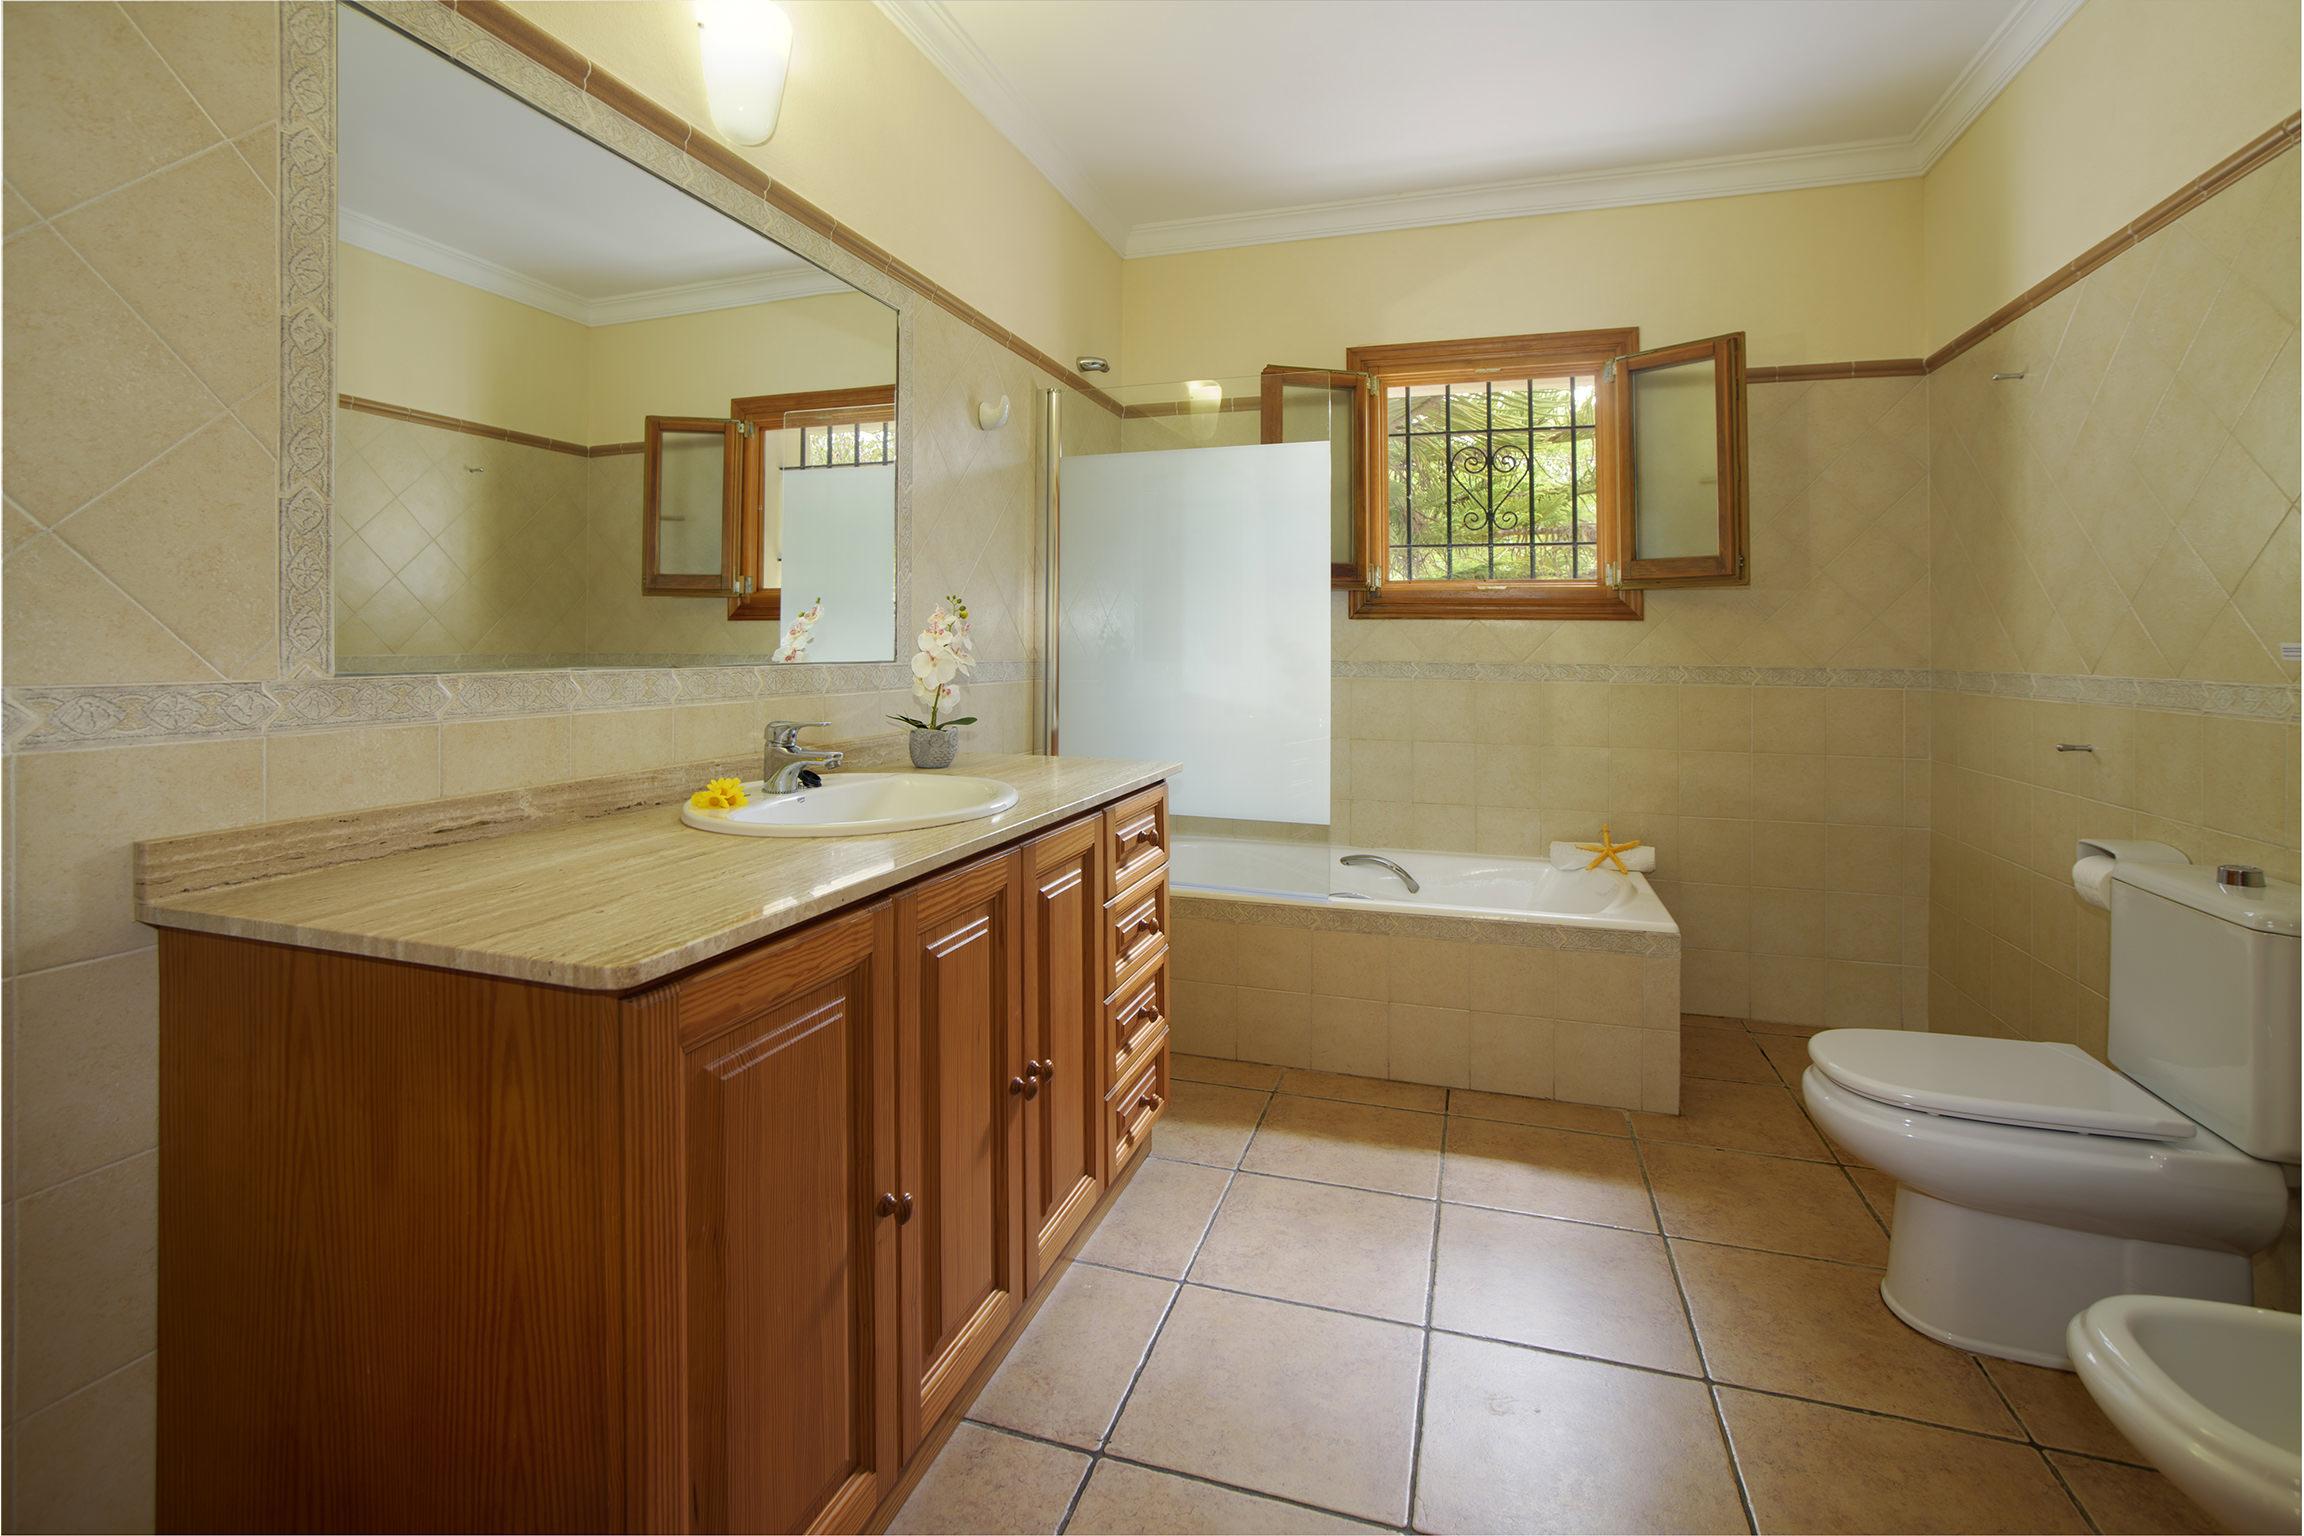 Apartment Son Peris photo 18490126